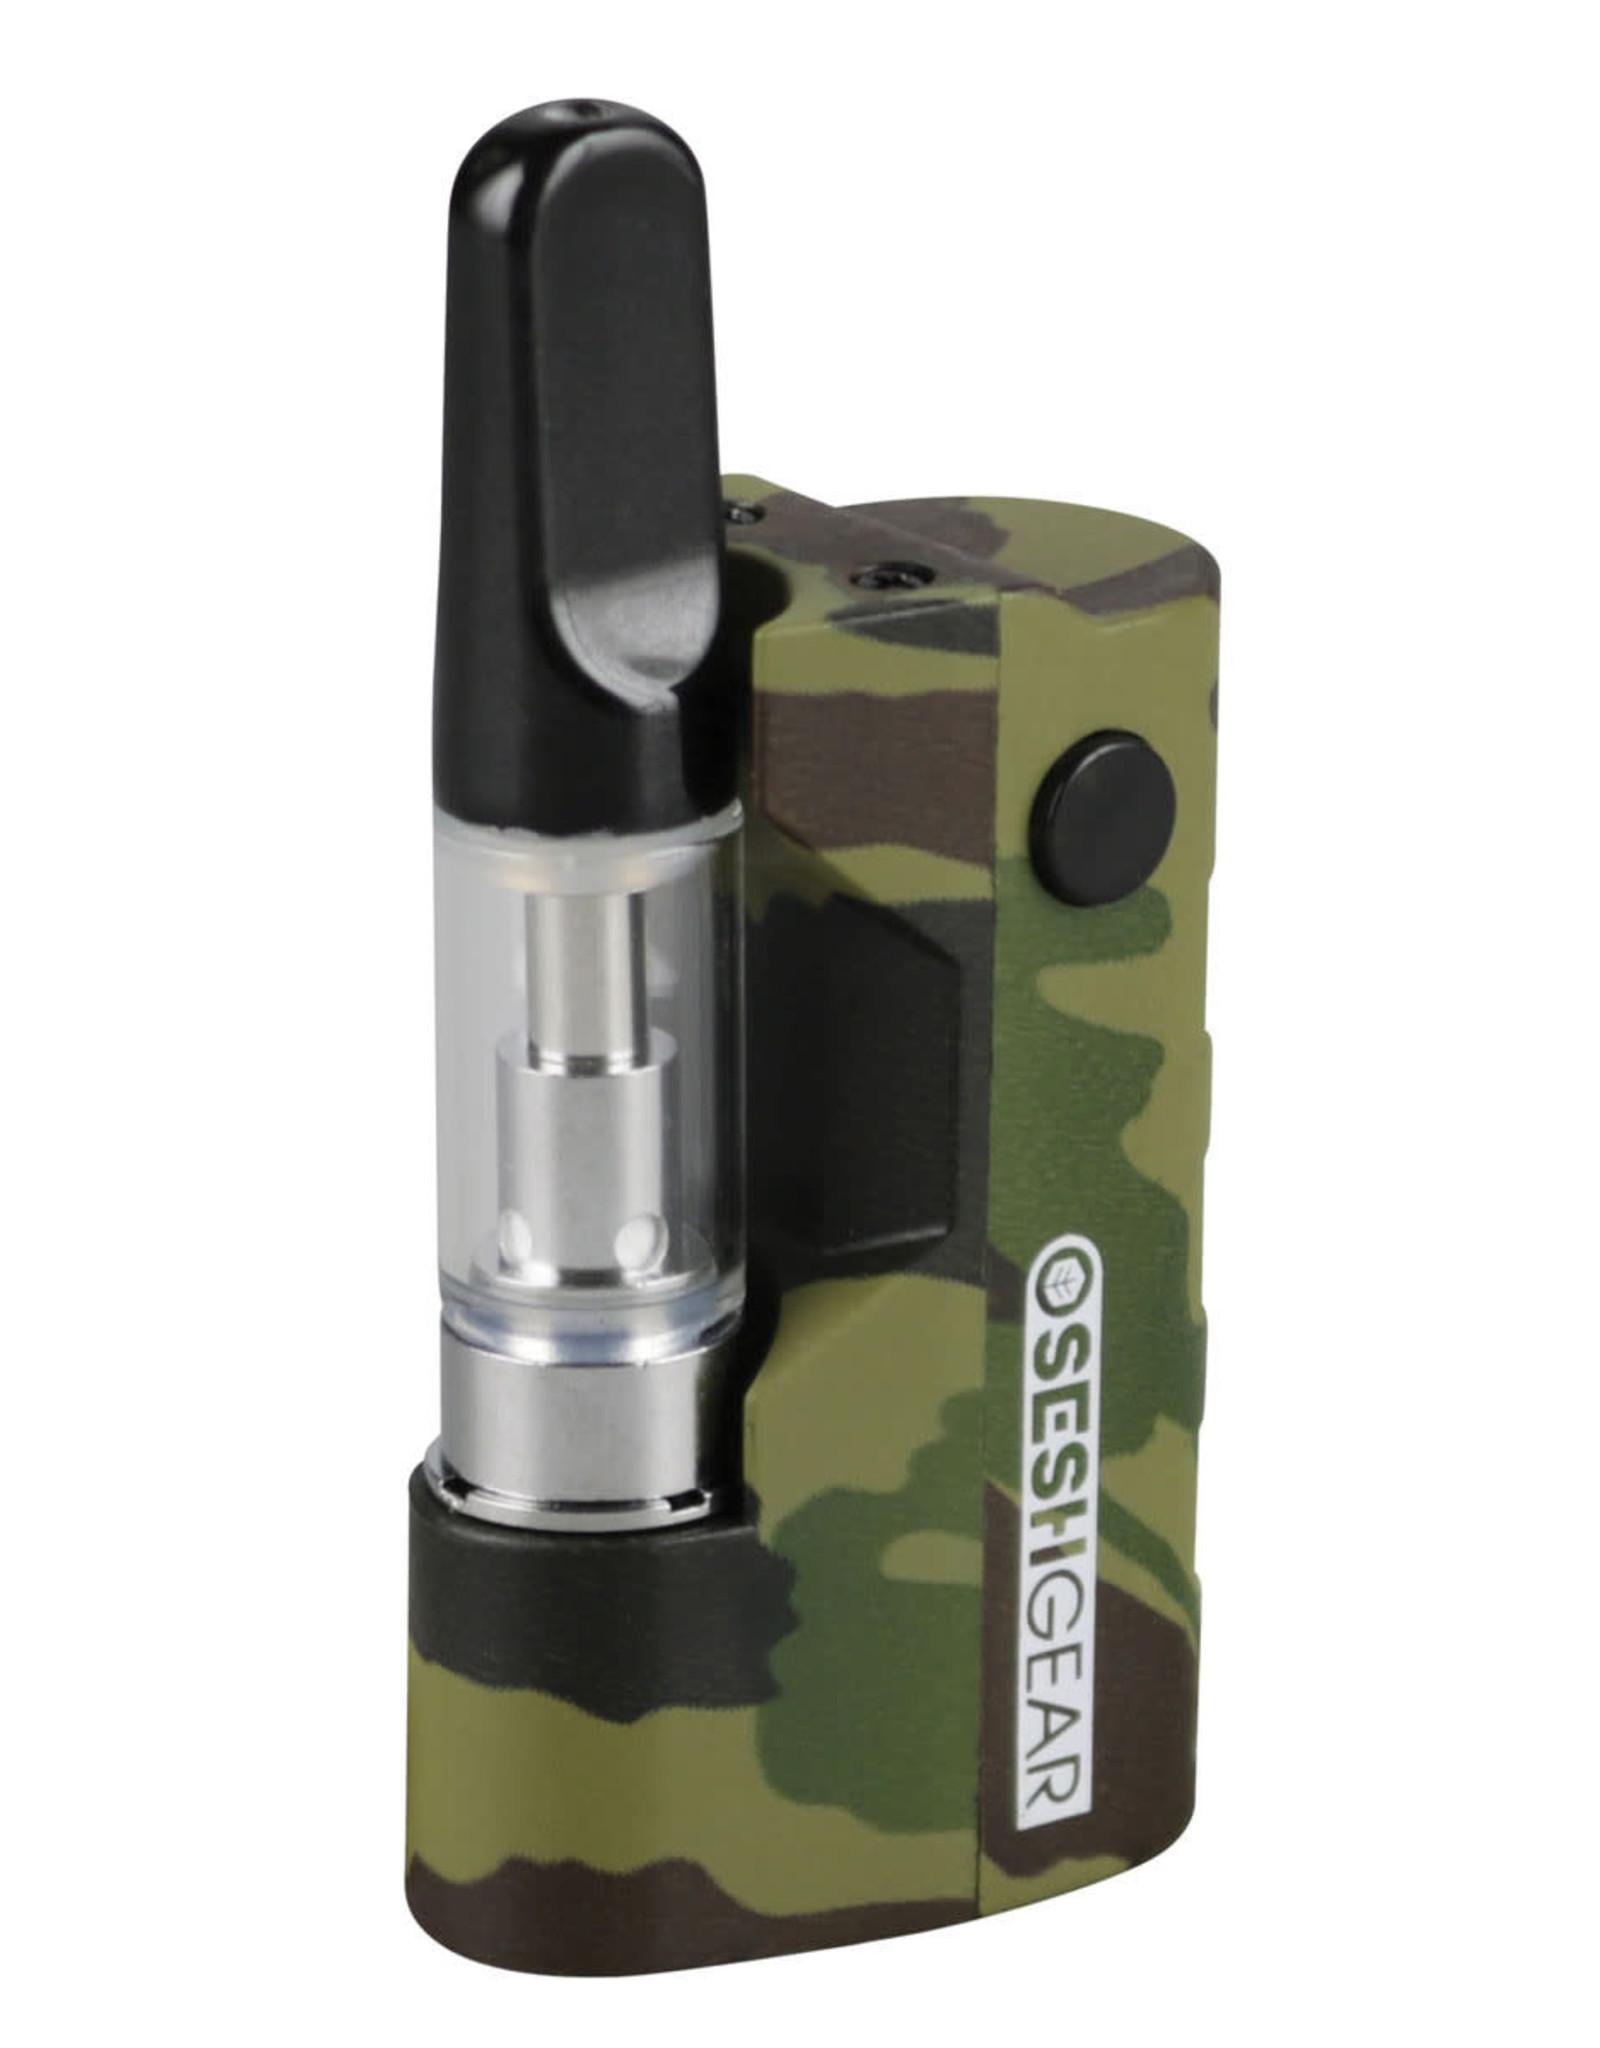 sesh gear SeshGear GIGI Variable Voltage Battery w/ Ceramic Cell - Camo